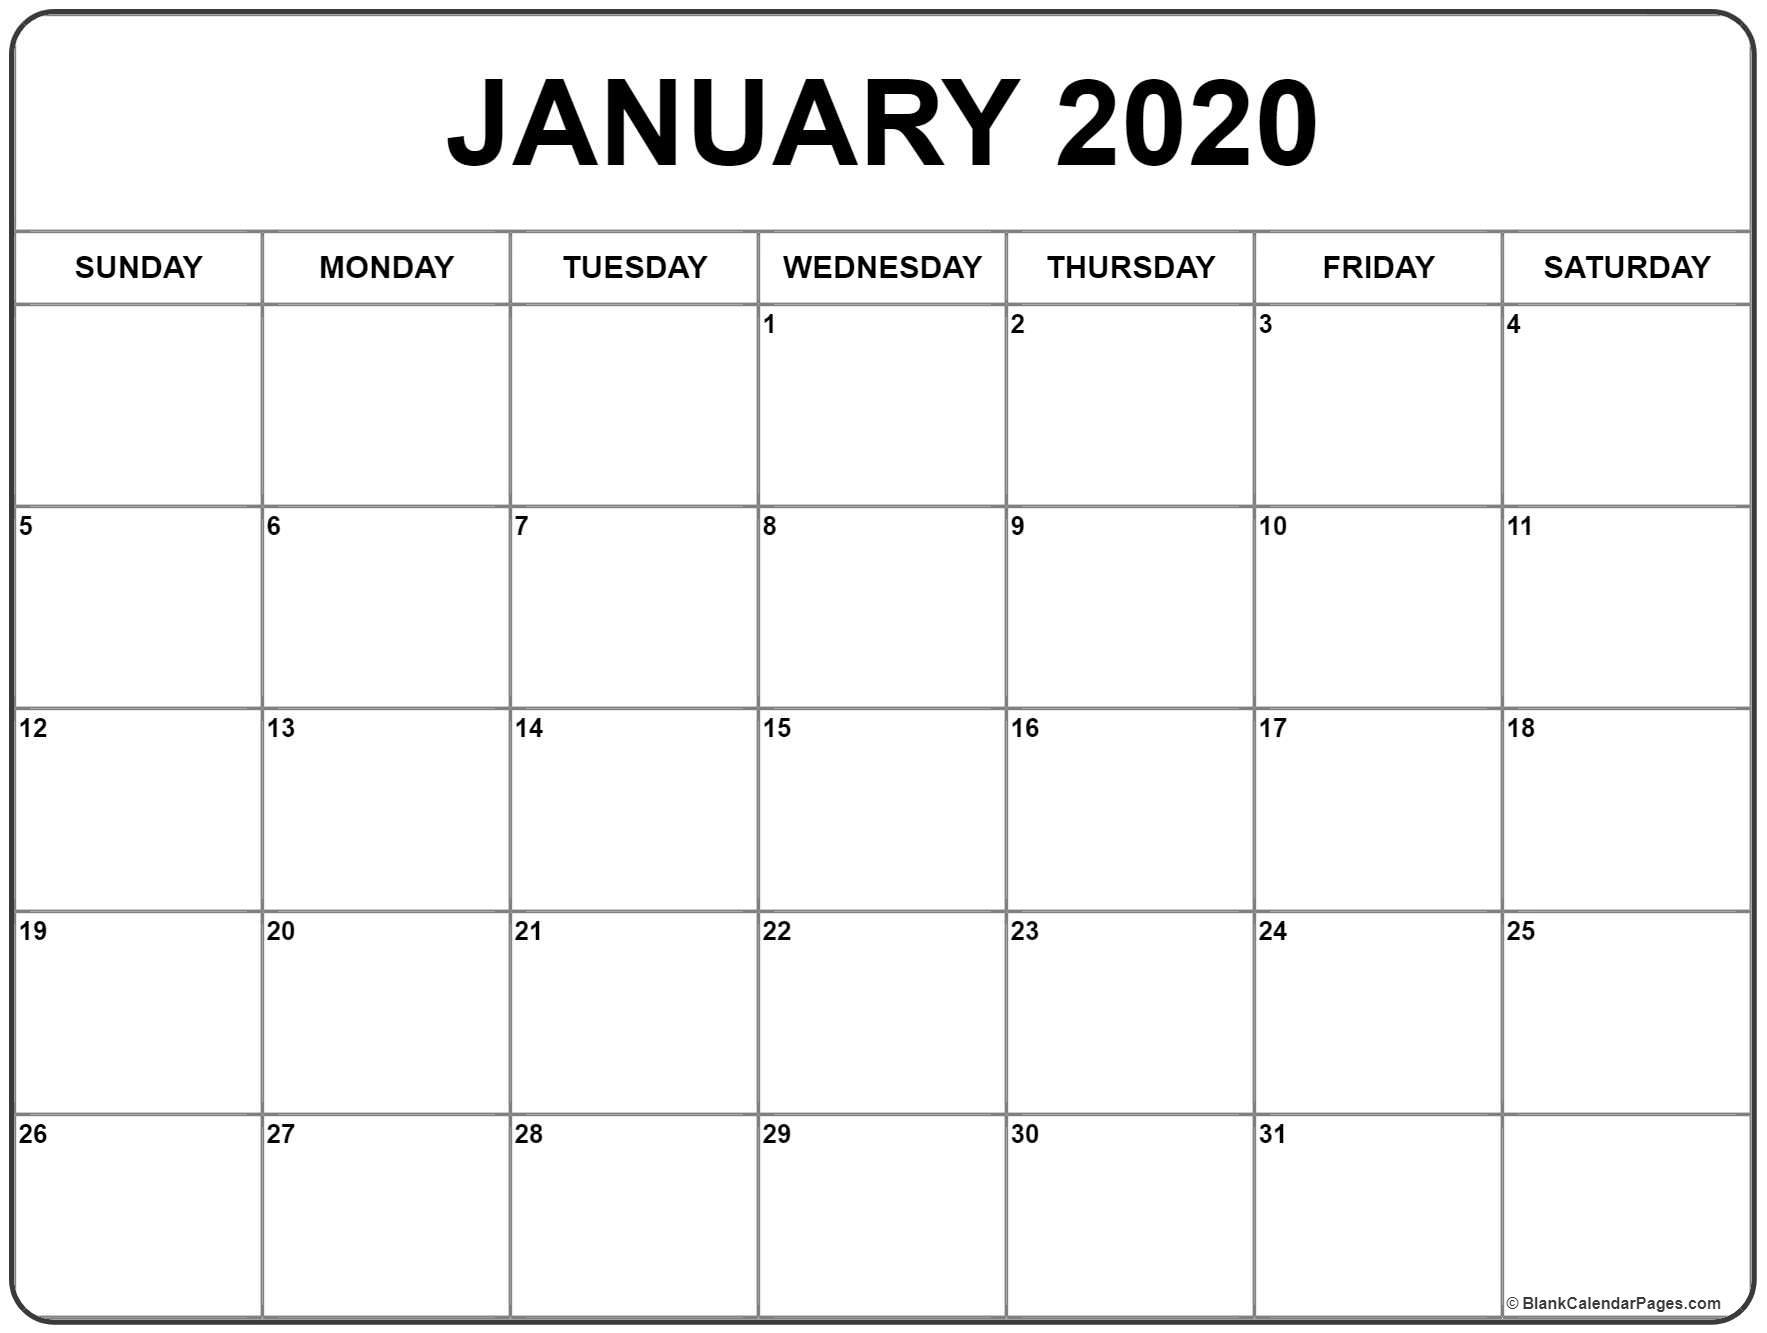 January 2020 Calendar | Free Printable Monthly Calendars 2020 Calendar Holiday List